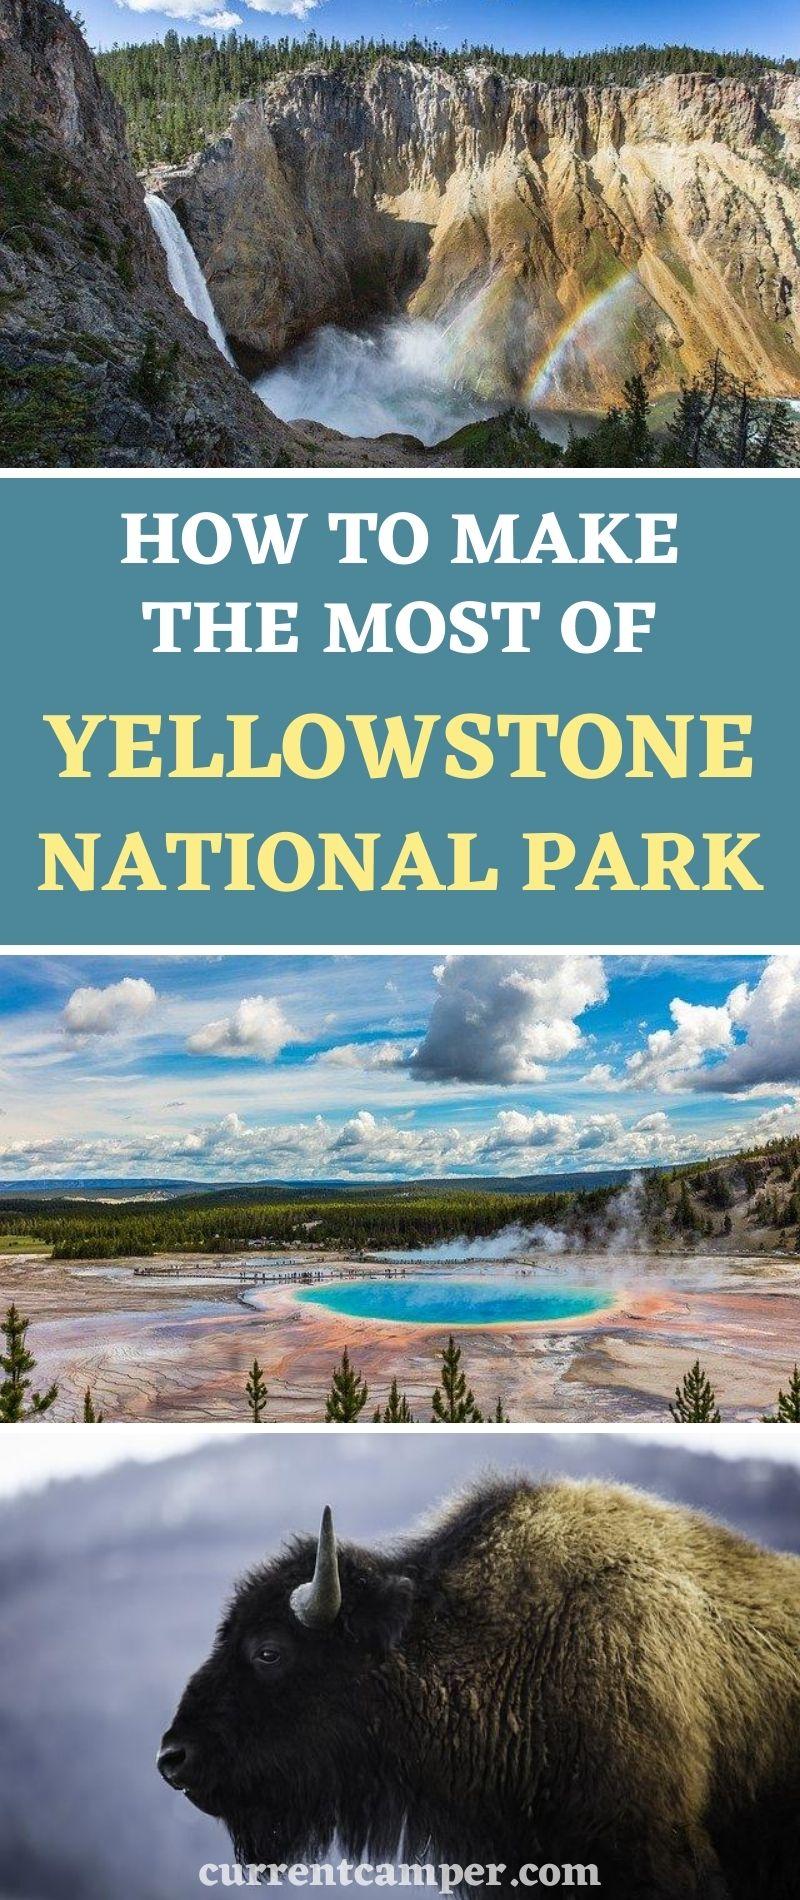 #yellowstone Yellowstone national park #nationalpark #nps #camping camping tips #travel #usa America